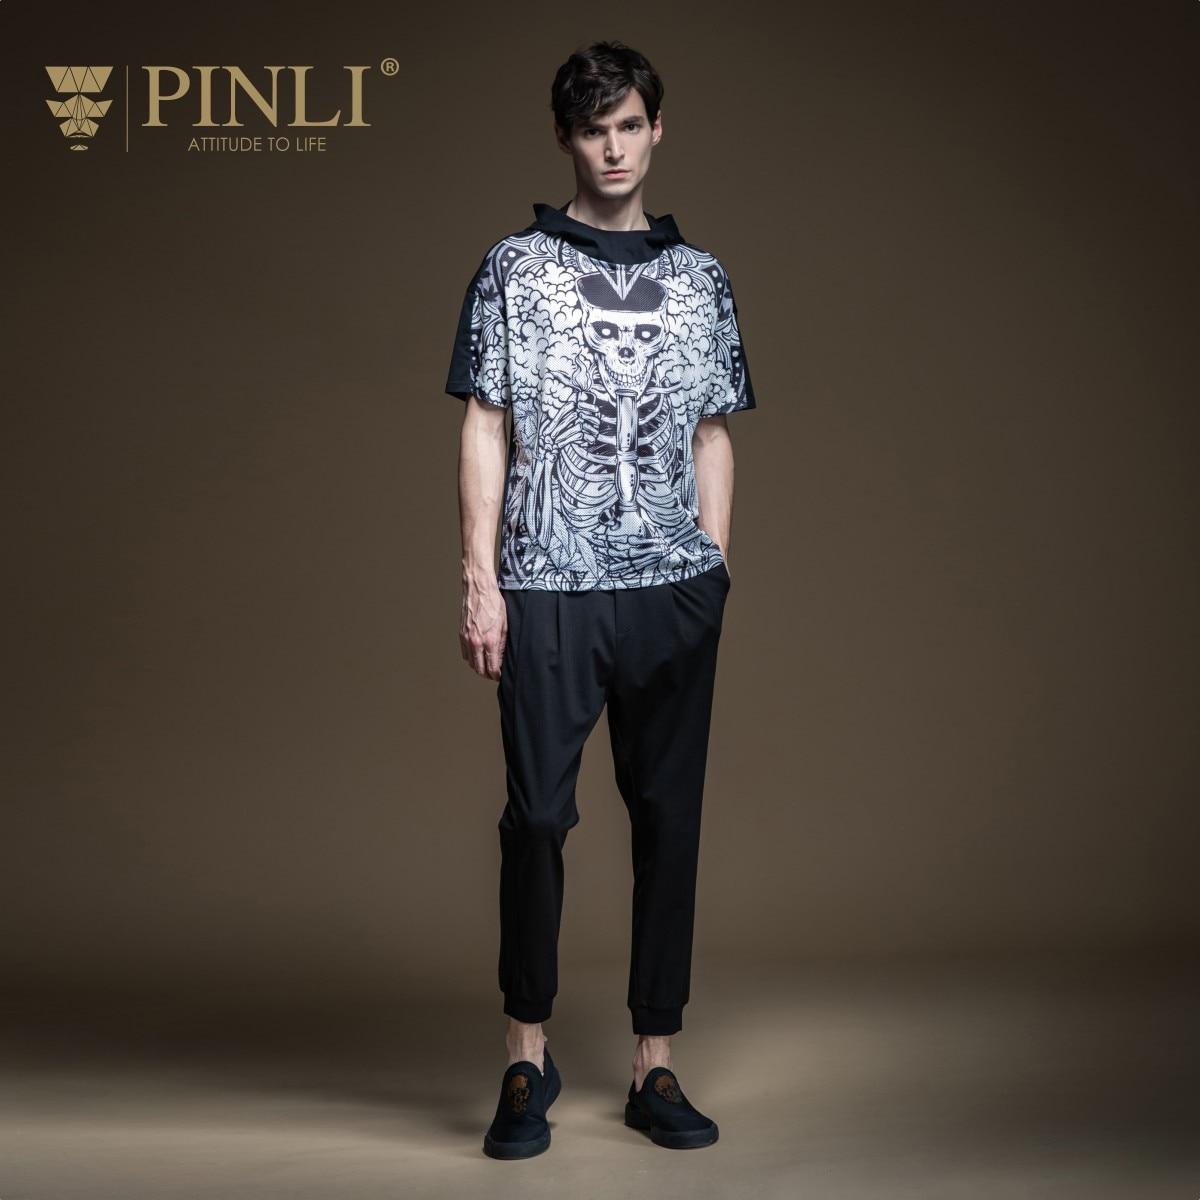 Pinli 2020 Summer New O-neck Slim Hooded Panel Gothic Printed Assembling Material Casual Men Short Sleeve T-shirt Hot B202511234